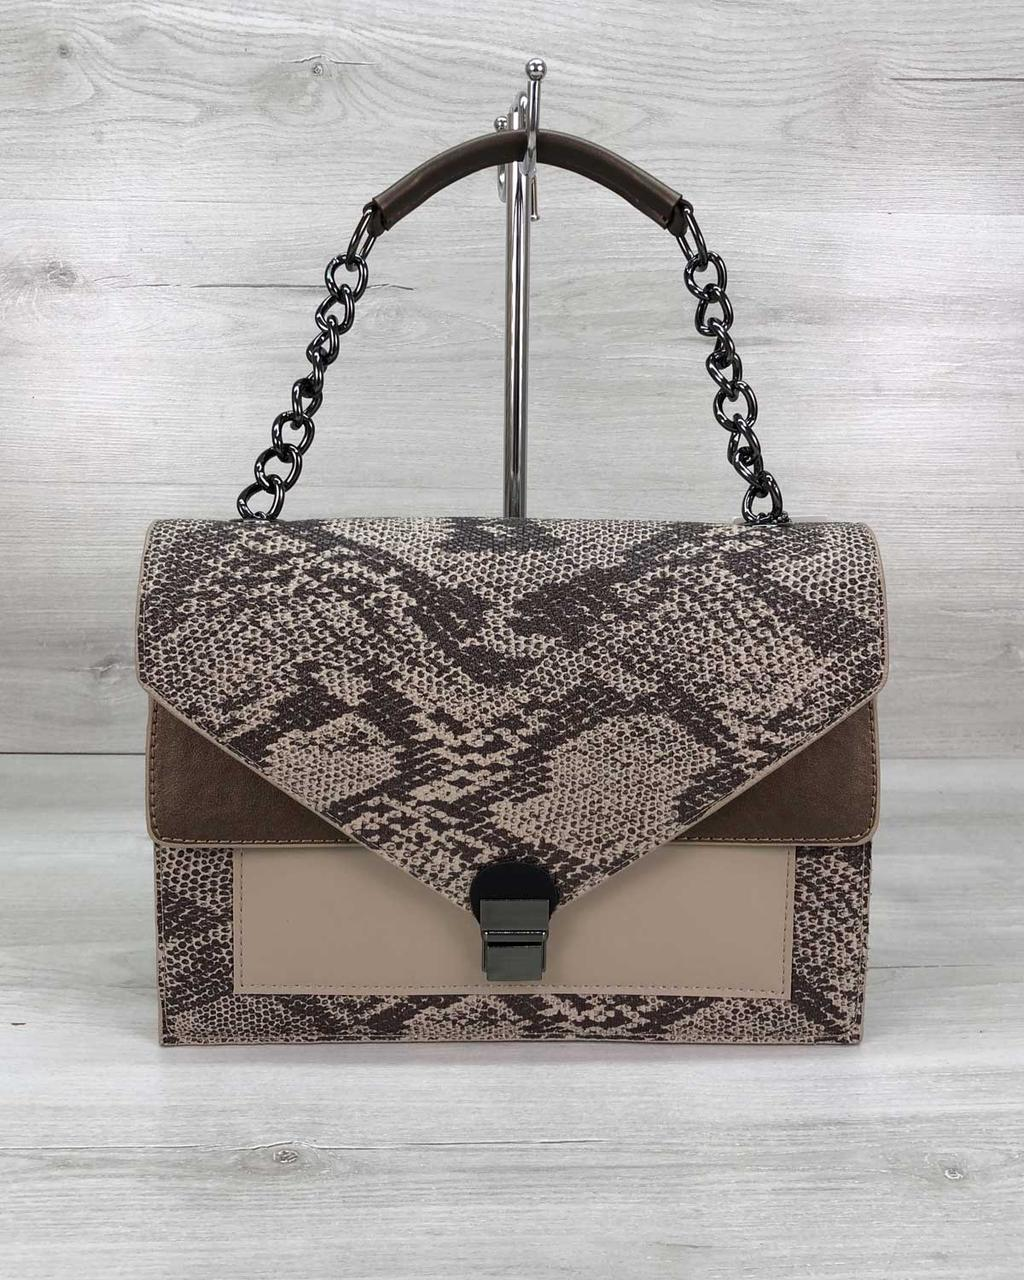 Молодежная каркасная сумка женская под змеиную кожу